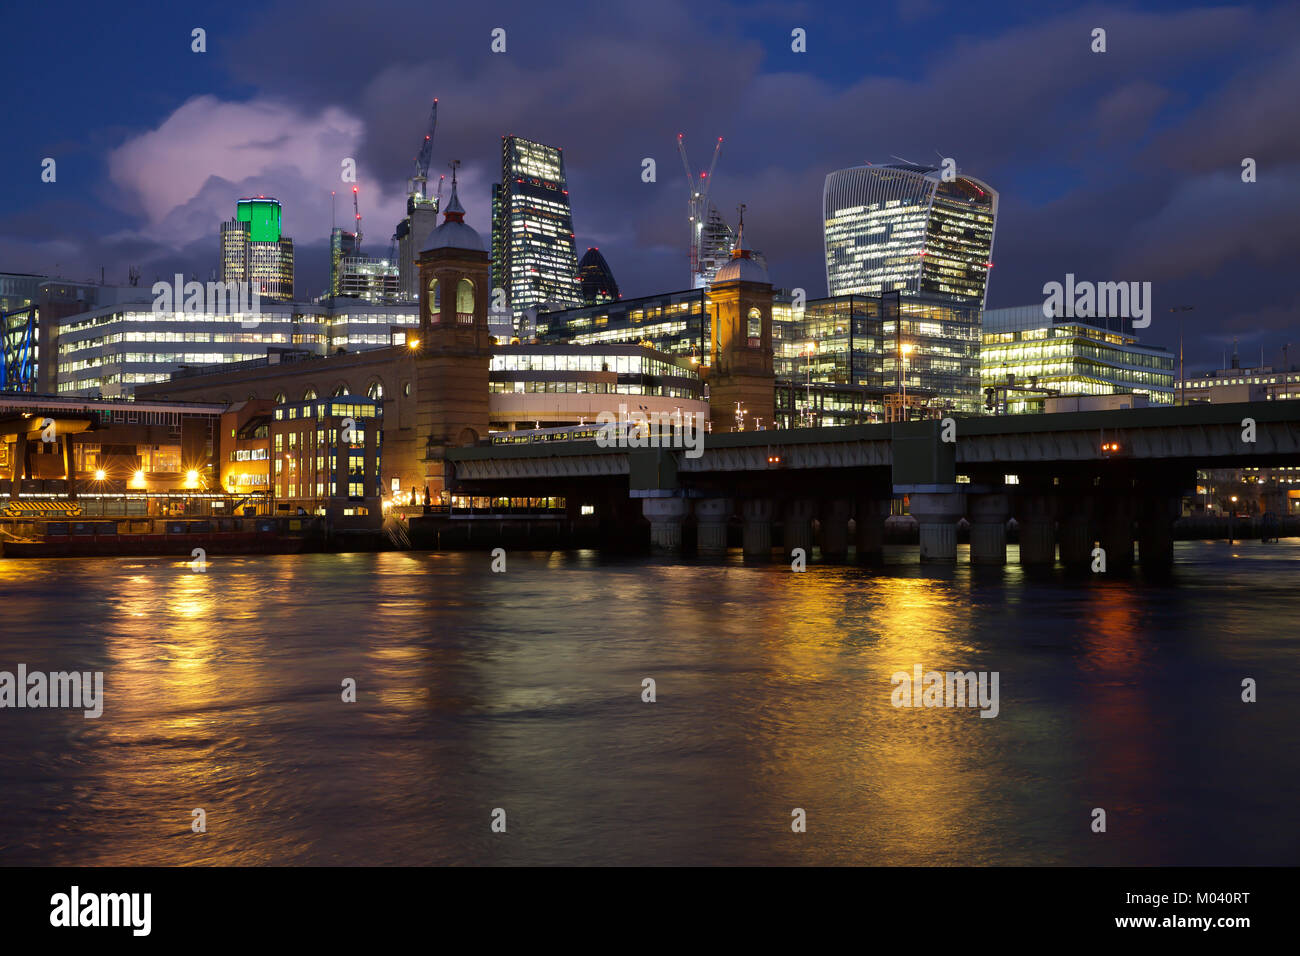 London, UK. 18th Jan, 2018. London skyline illuminated early evening Credit: Keith Larby/Alamy Live News - Stock Image